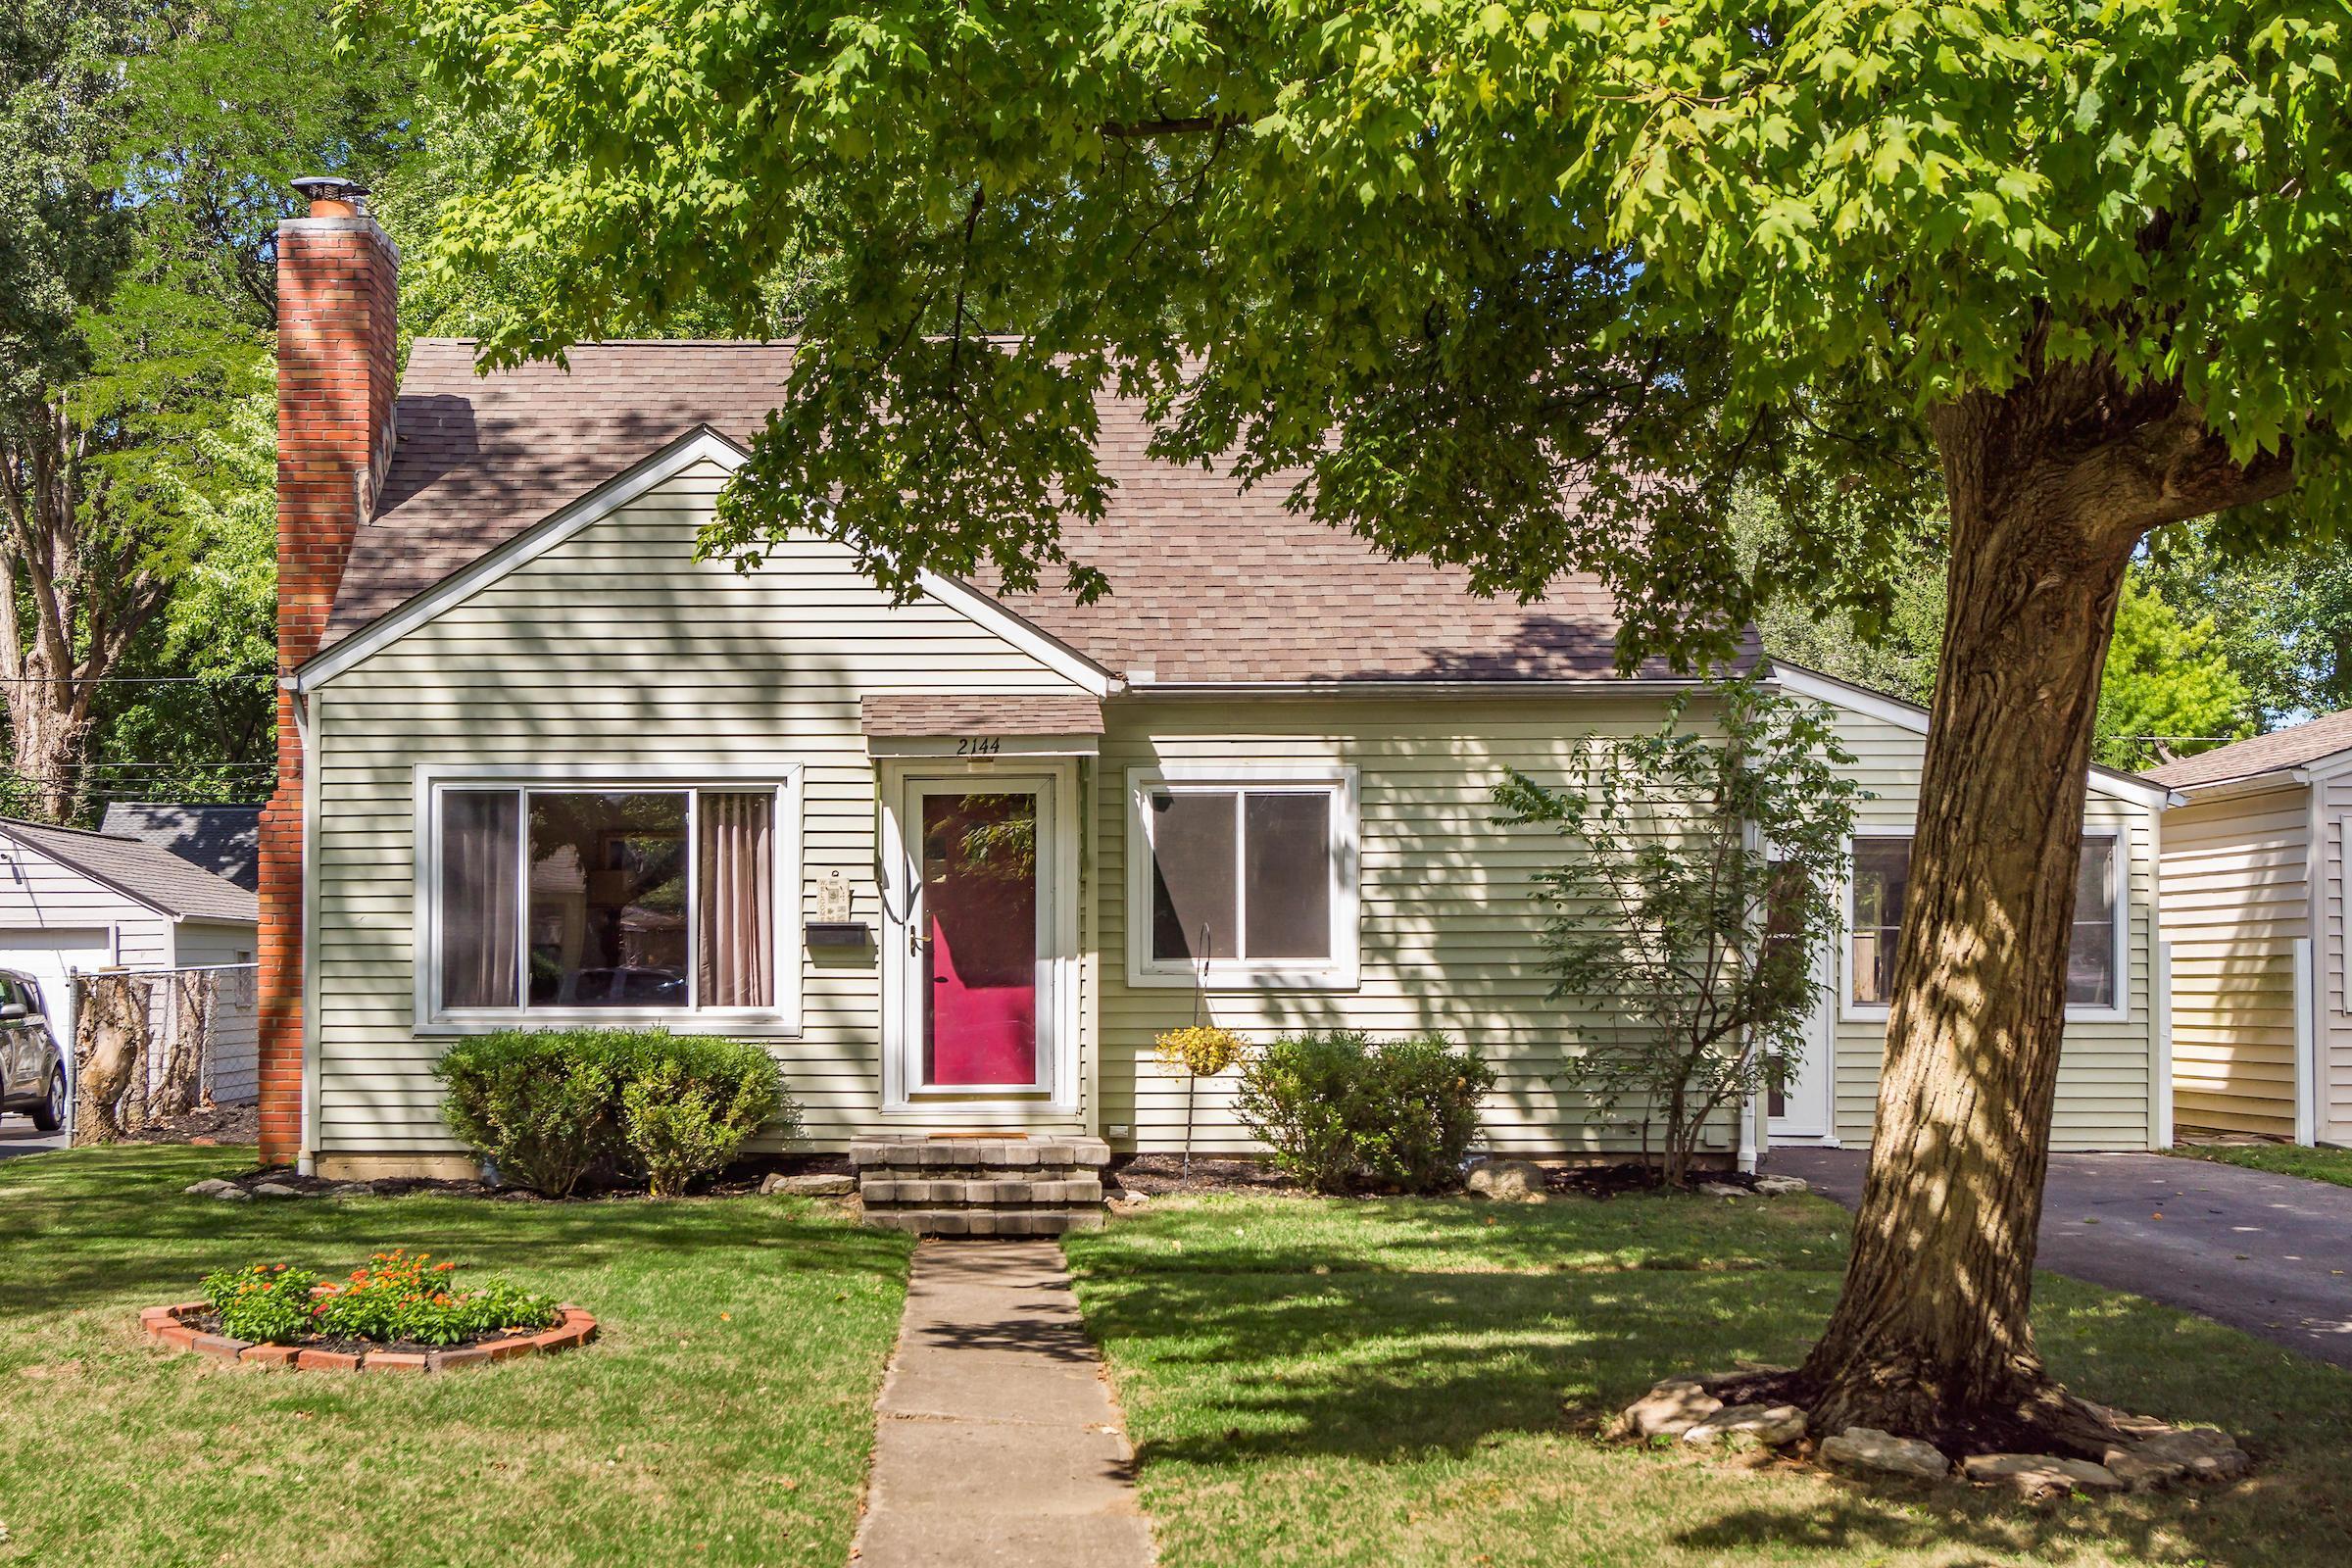 2144 Ridgecliff Road, Upper Arlington, Ohio 43221, 3 Bedrooms Bedrooms, ,2 BathroomsBathrooms,Residential,For Sale,Ridgecliff,220031219